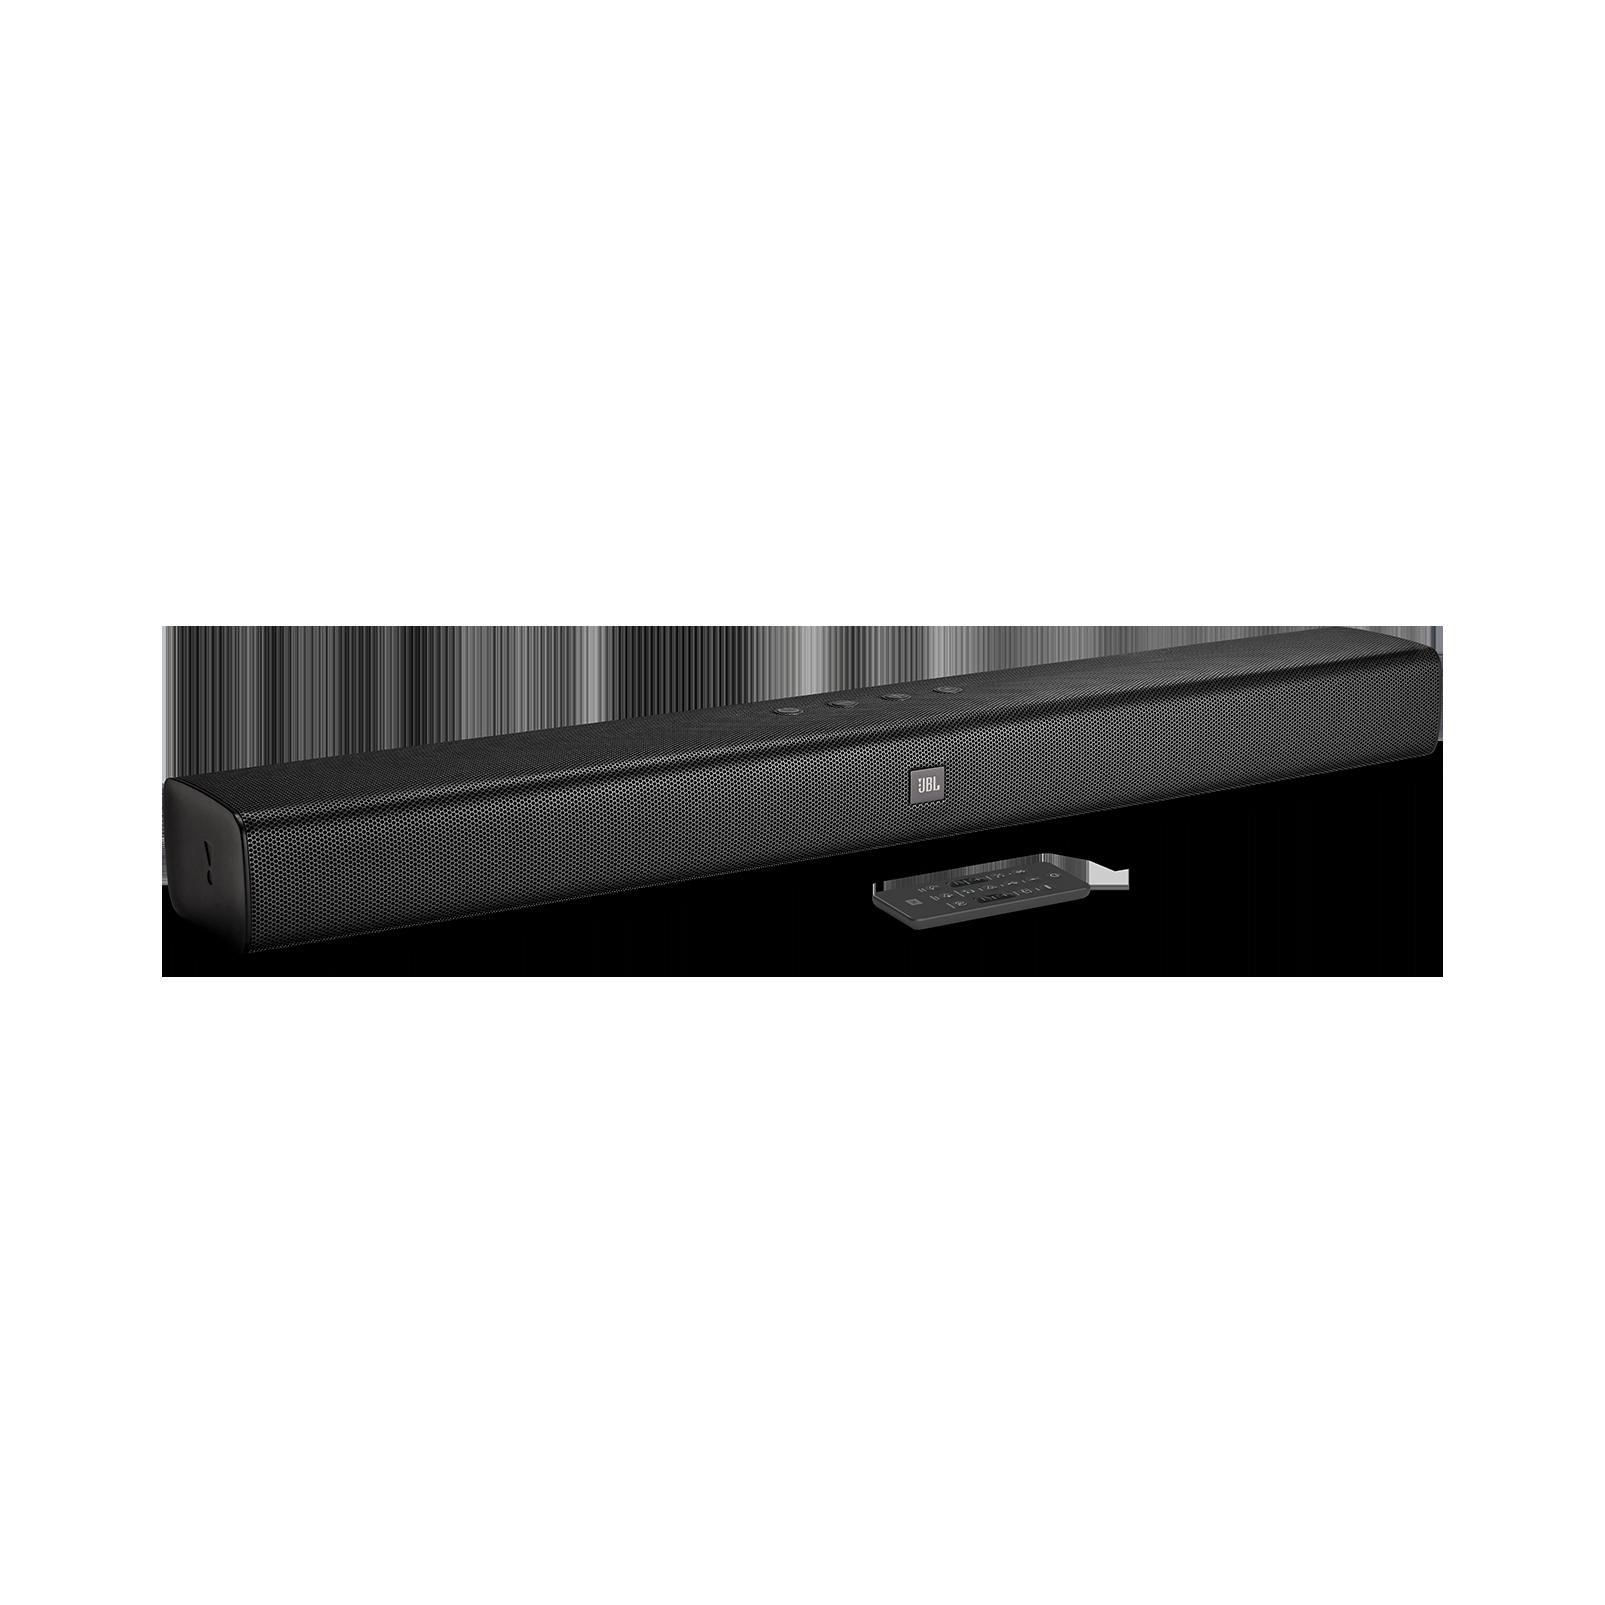 JBL Bar Studio - Black - 2.0 - Channel Soundbar with Bluetooth - Hero